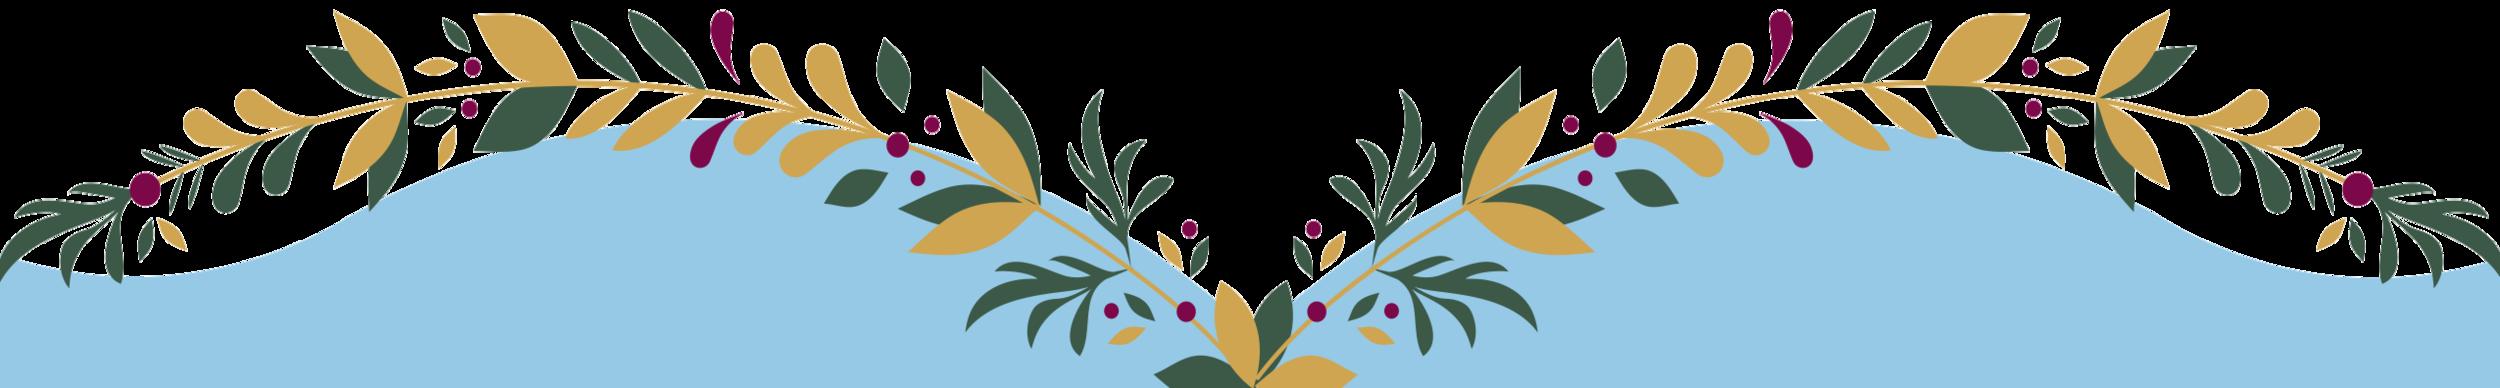 Christmas Schedule - Bottom Bar.png